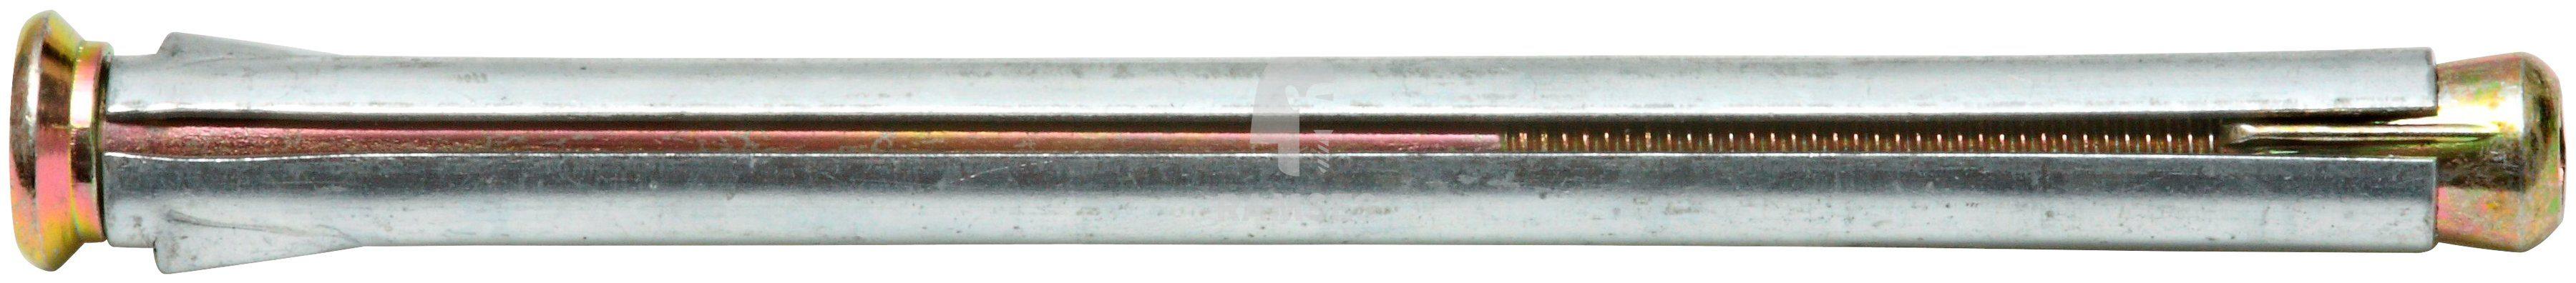 RAMSES Dübel , Metallrahmendübel 10 X 152 mm, 50 Stück